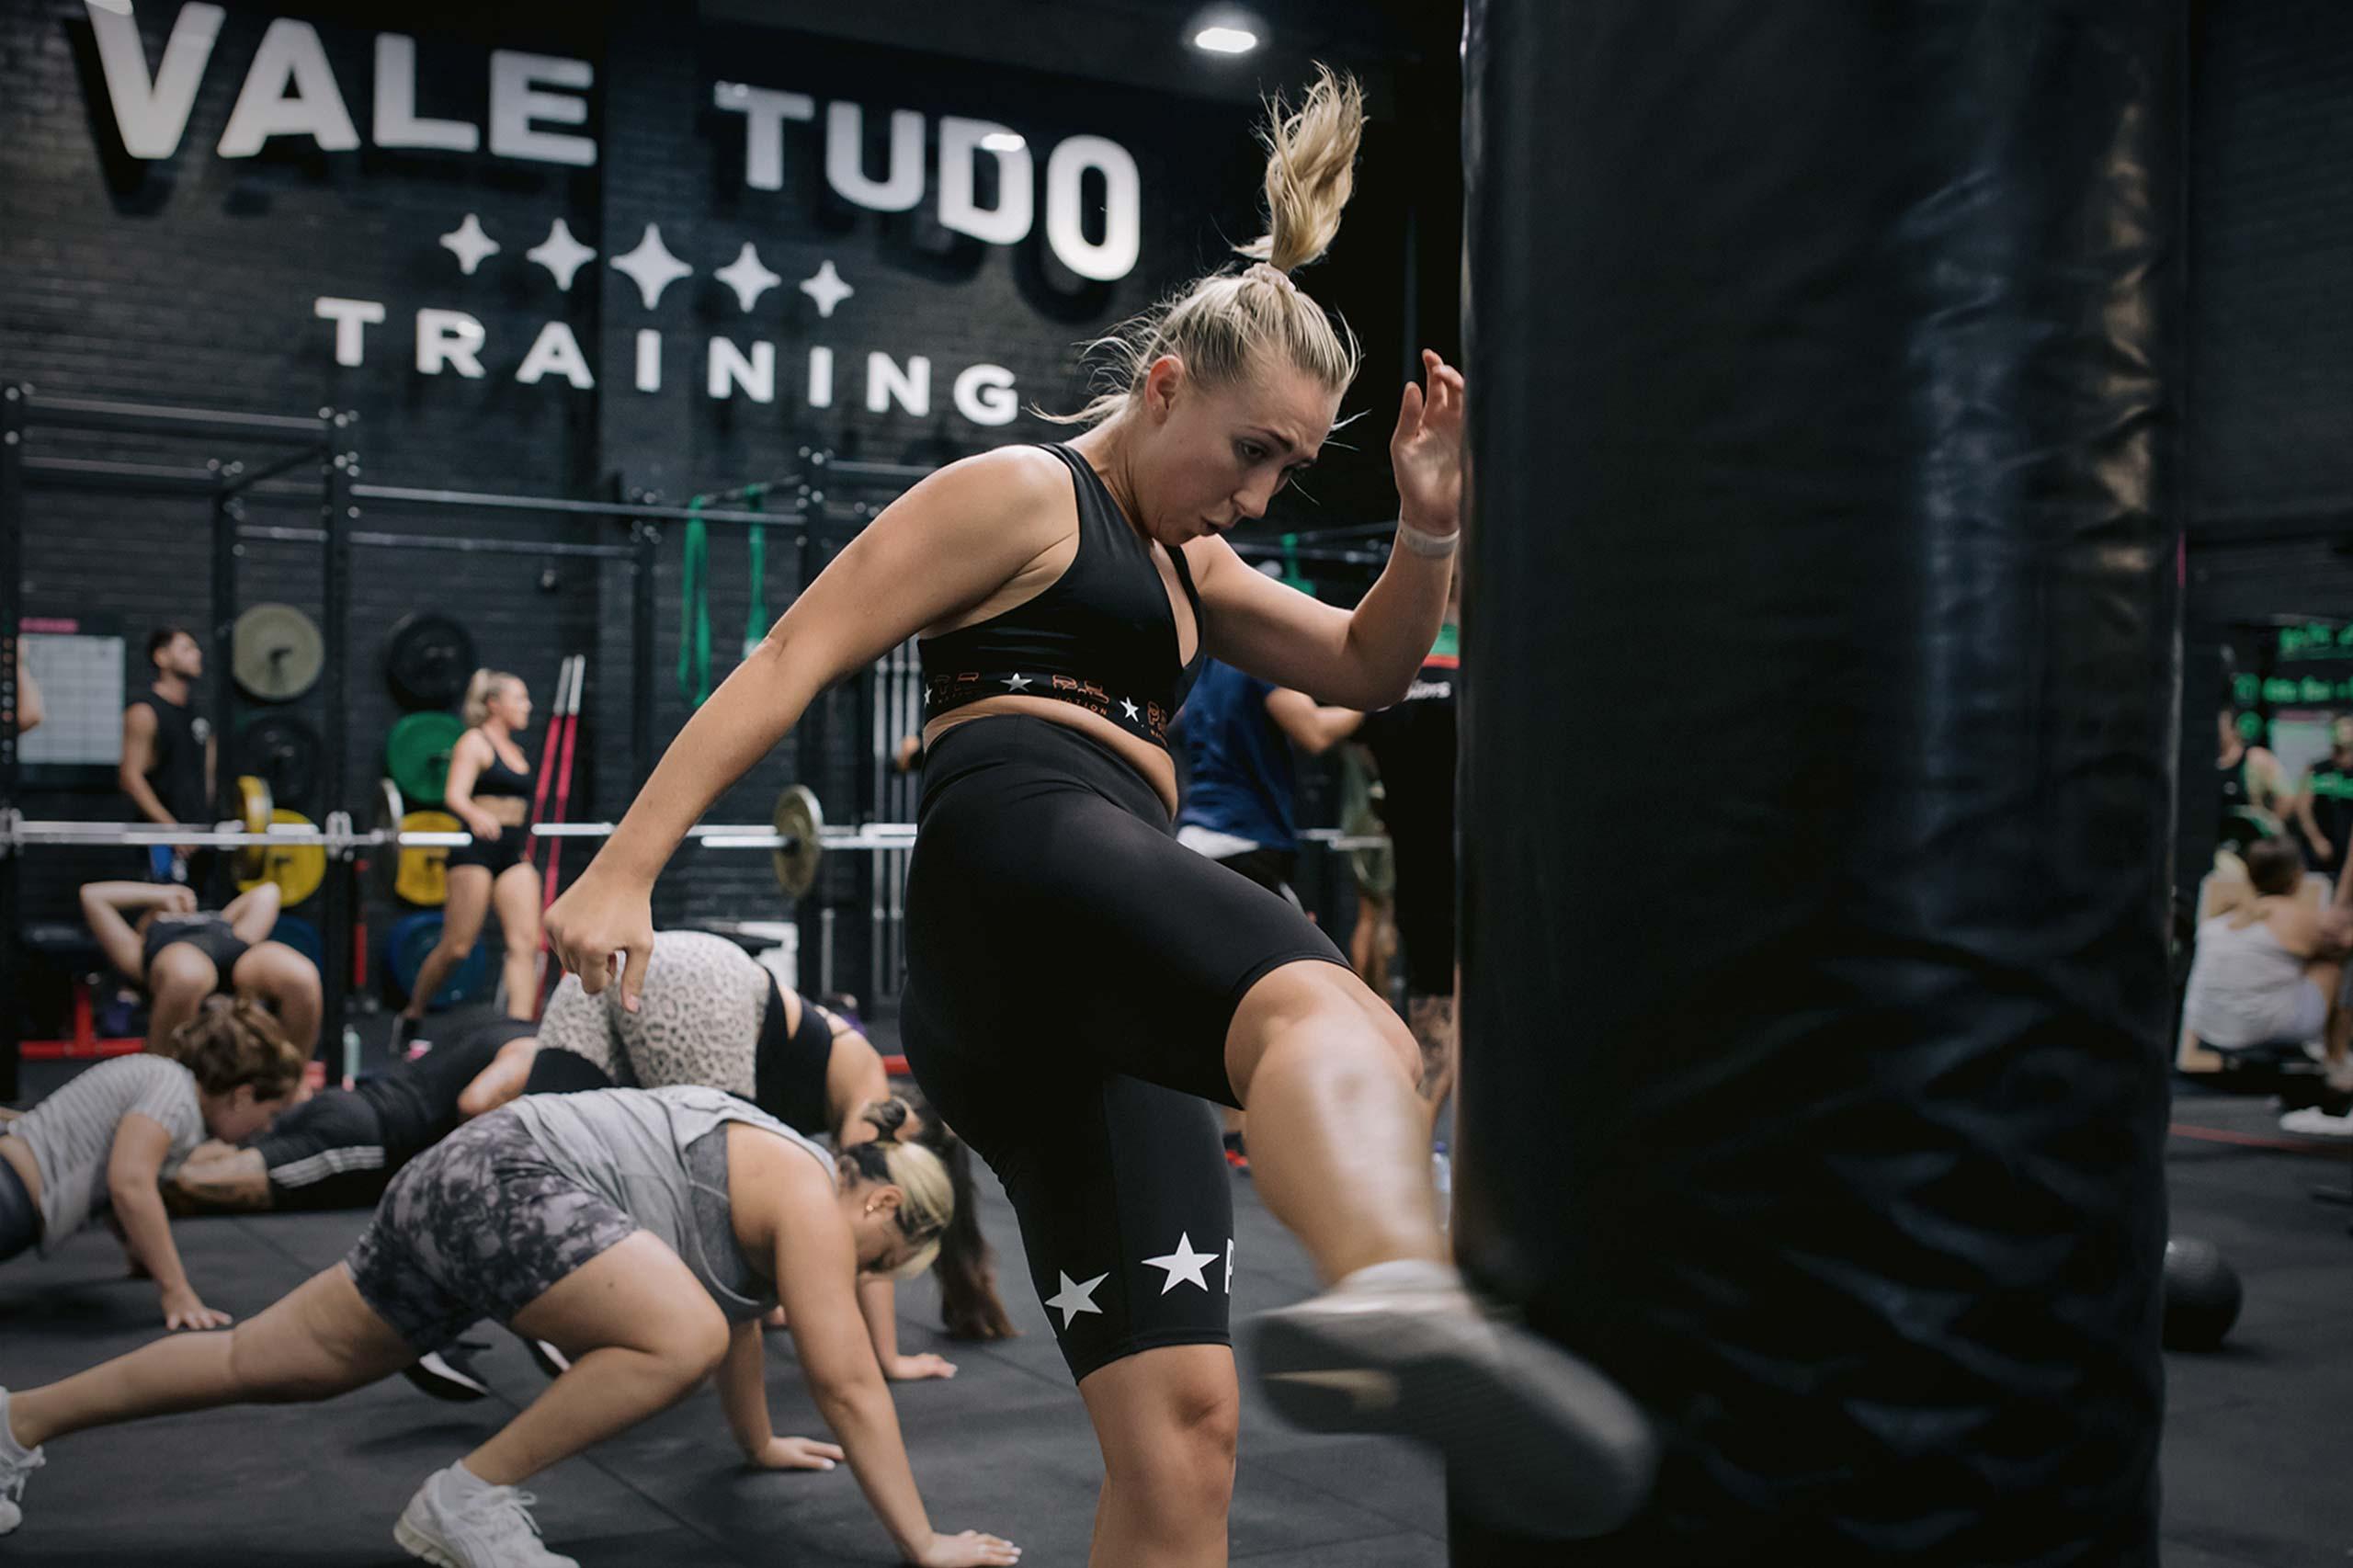 female athlete training kickboxing and mixed martial arts